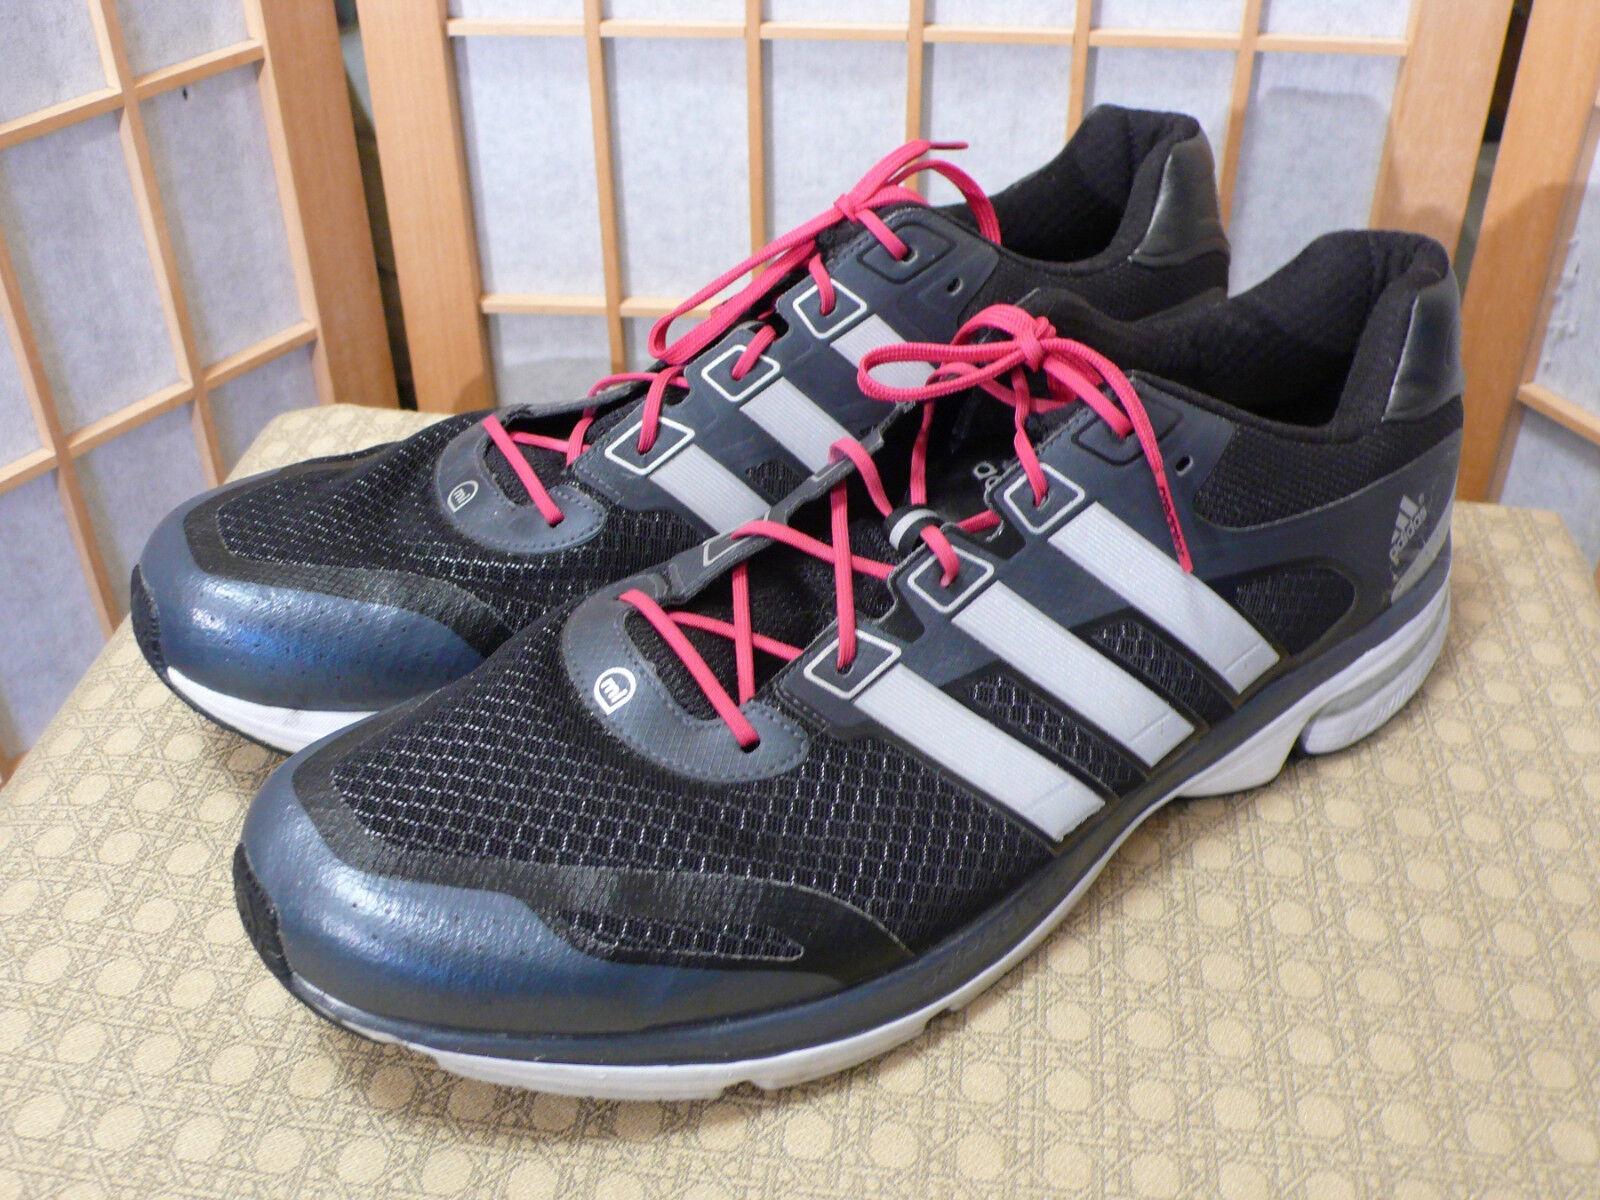 Adidas Supernova Running Shoes Mens Comfortable Cheap women's shoes women's shoes